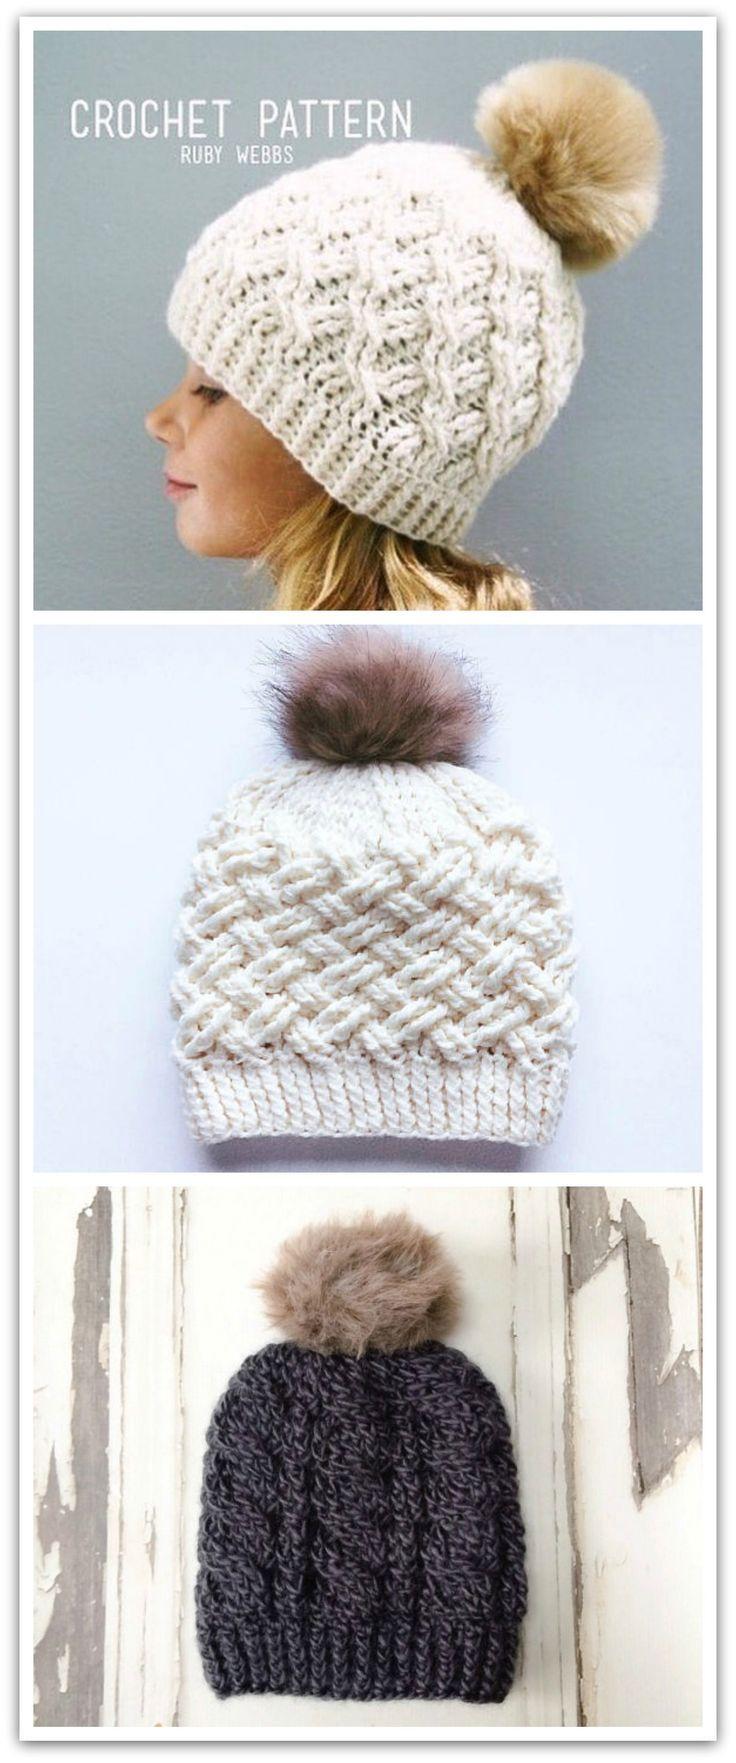 CROCHET PATTERN, Crochet Hat Pattern, Crochet Cables, DIY Hat Pattern